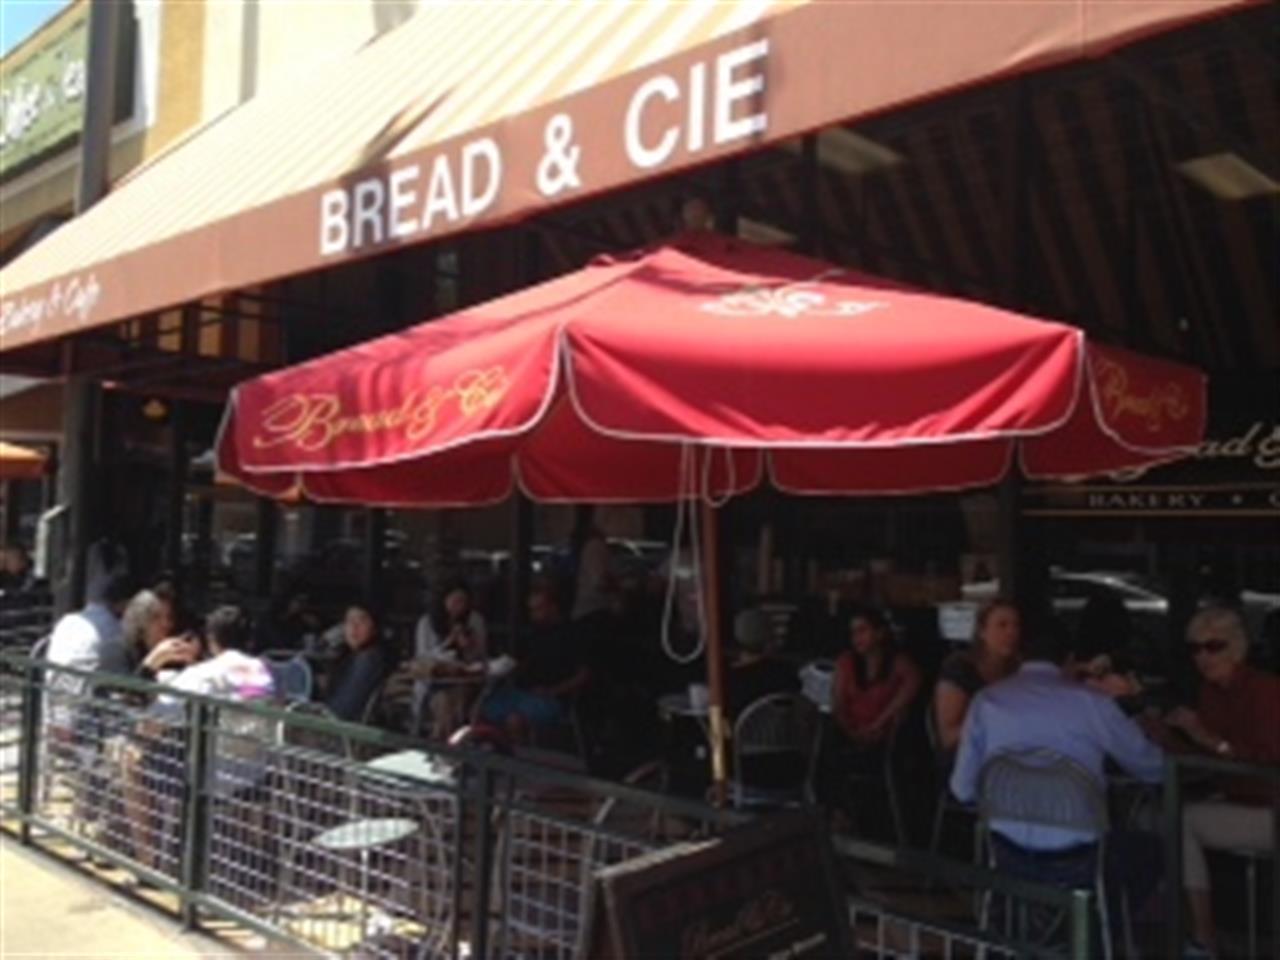 #San Diego #Bread & Cie #leadingRElocal